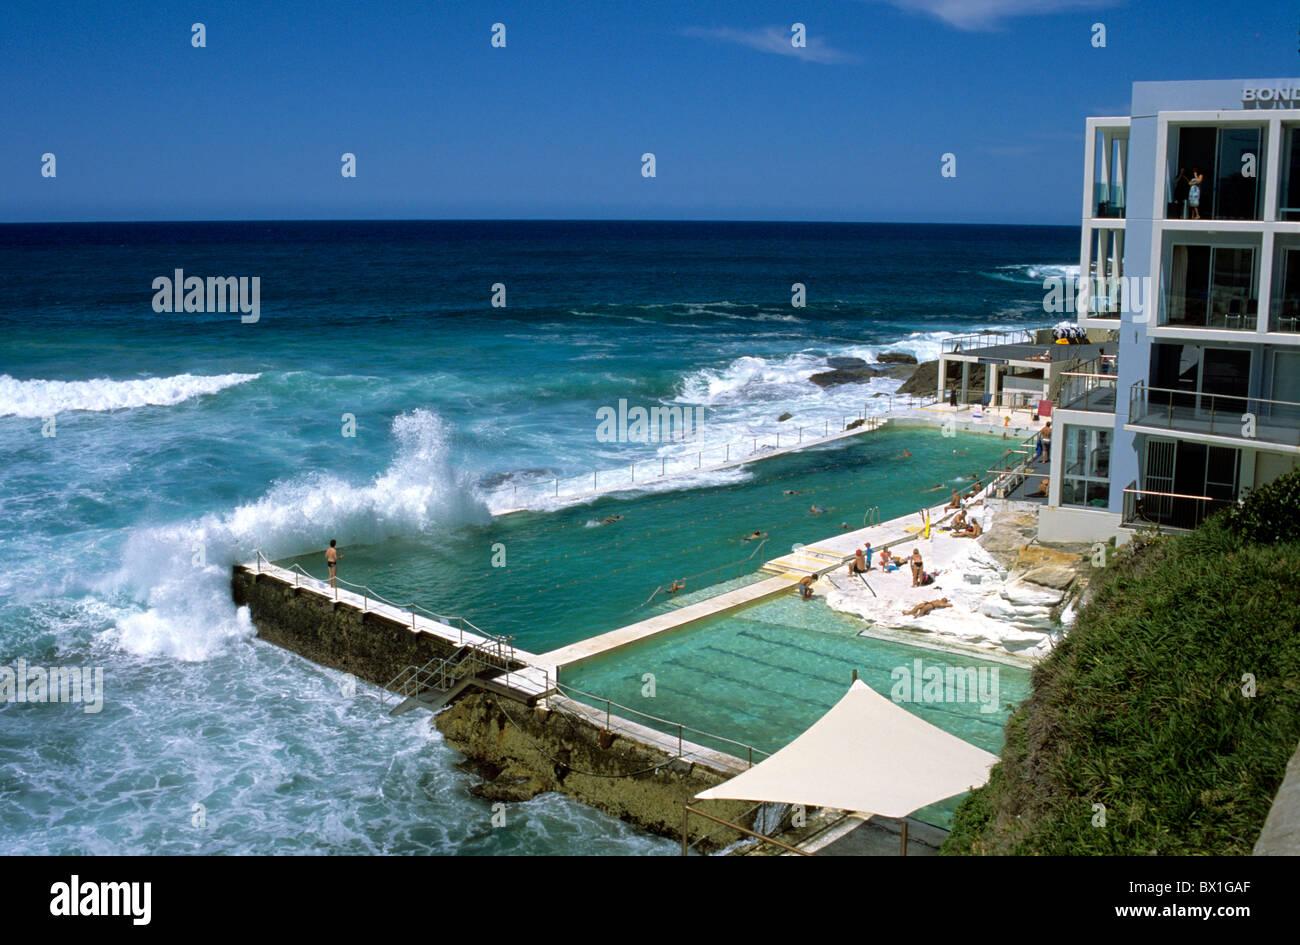 Australia bondi beach bondi icebergs saltwater swimming - Hotels with saltwater swimming pools ...